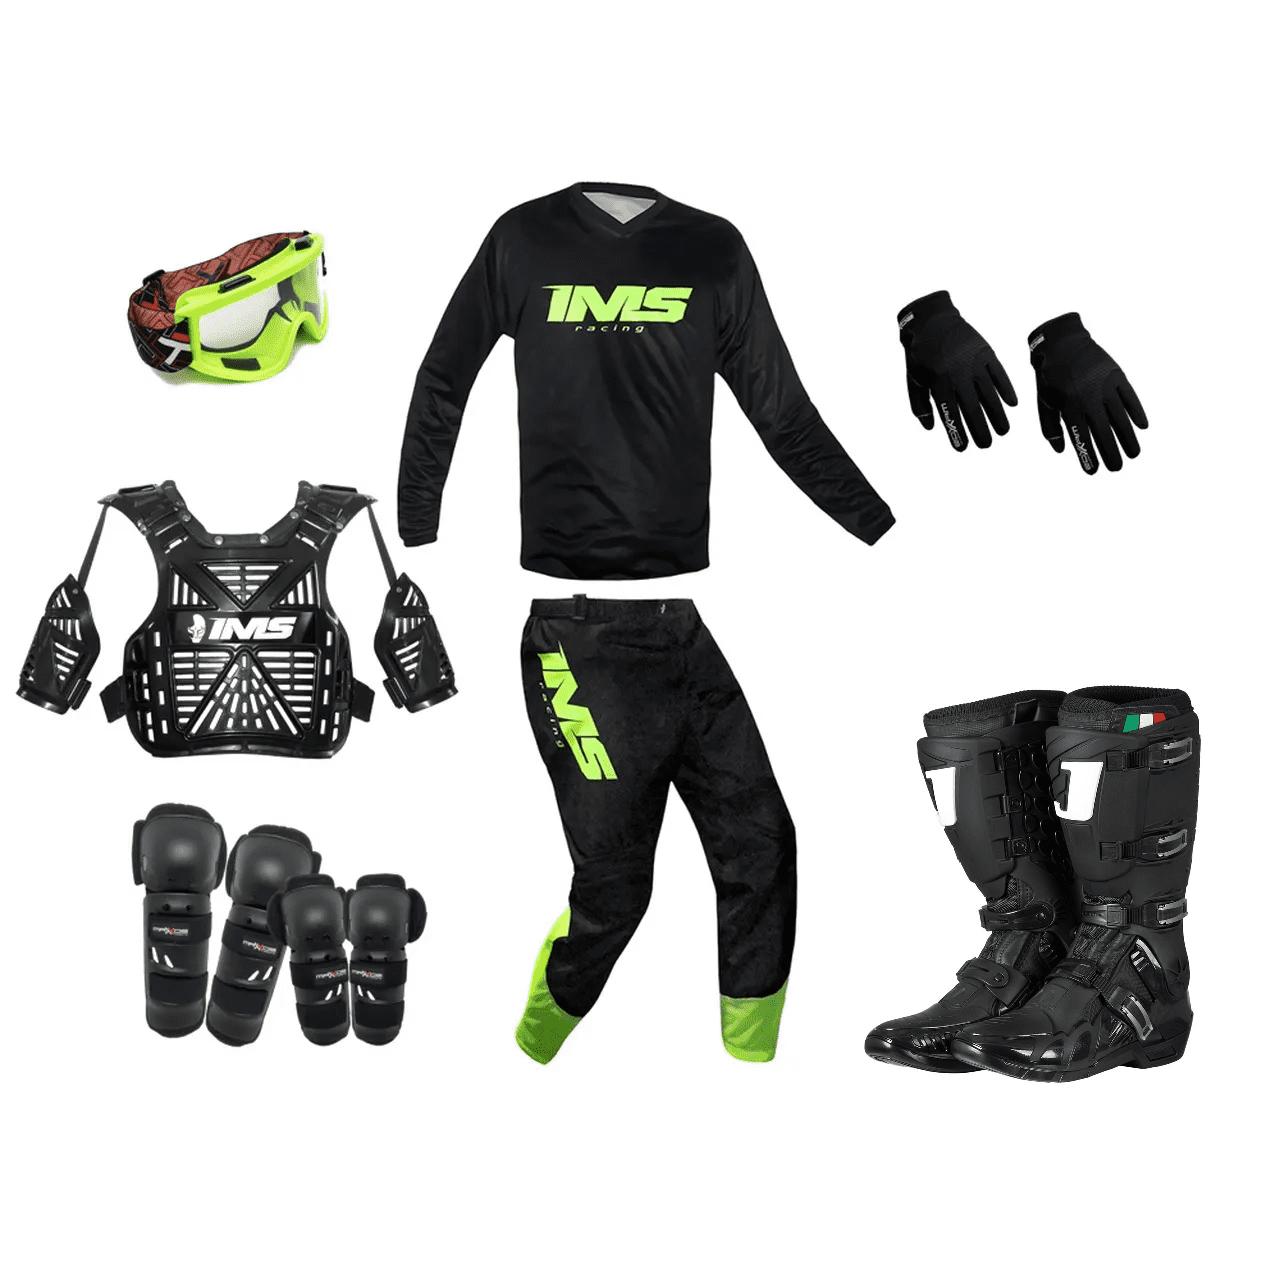 Kit Equipamento Trilha Motocross Enduro Basic - Preto/Fluor